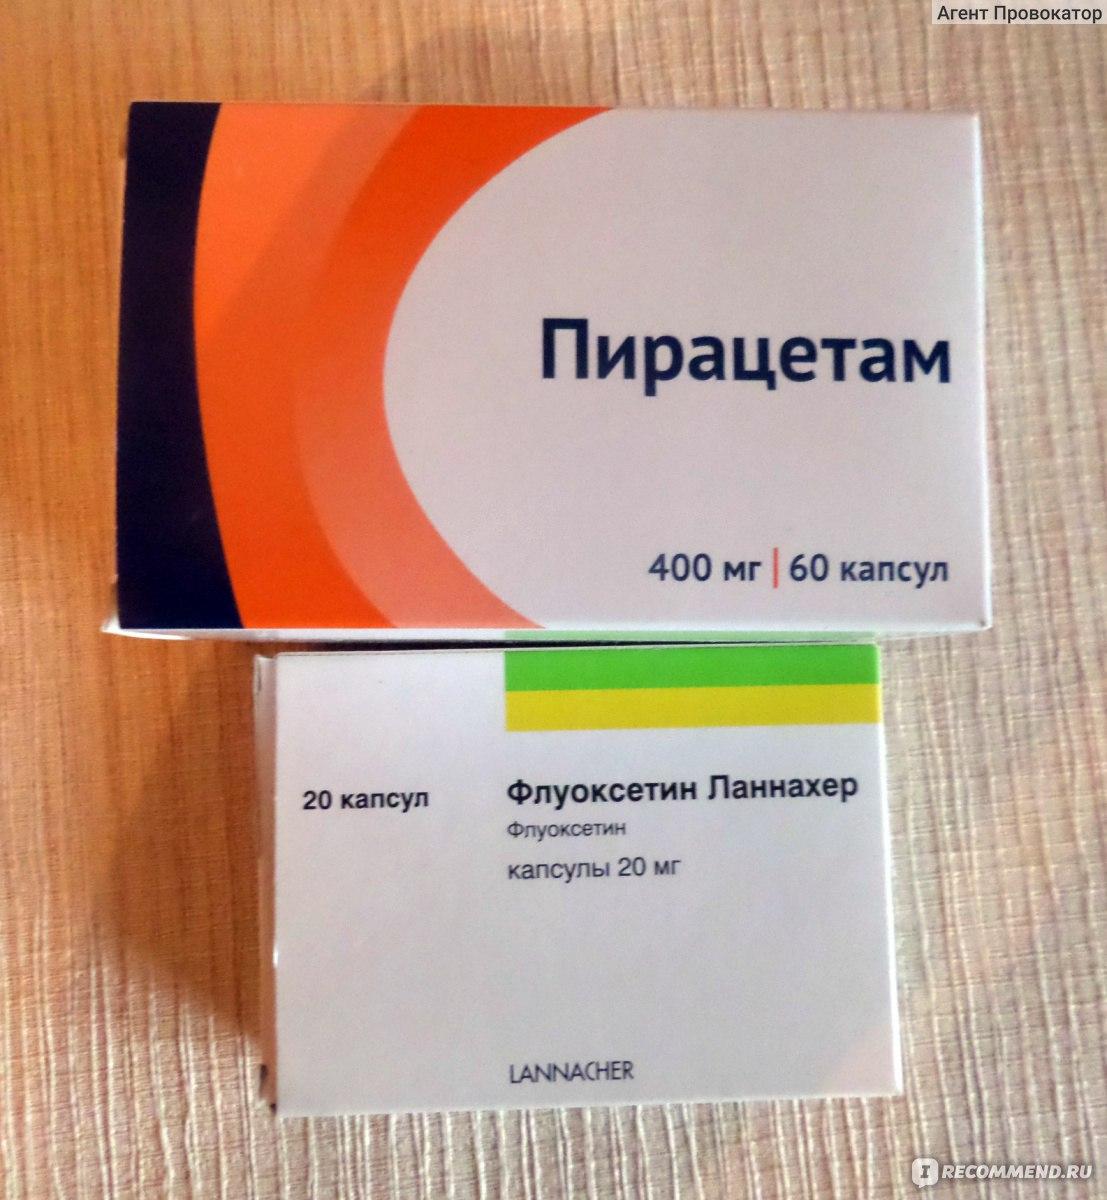 Concerta And Viagra